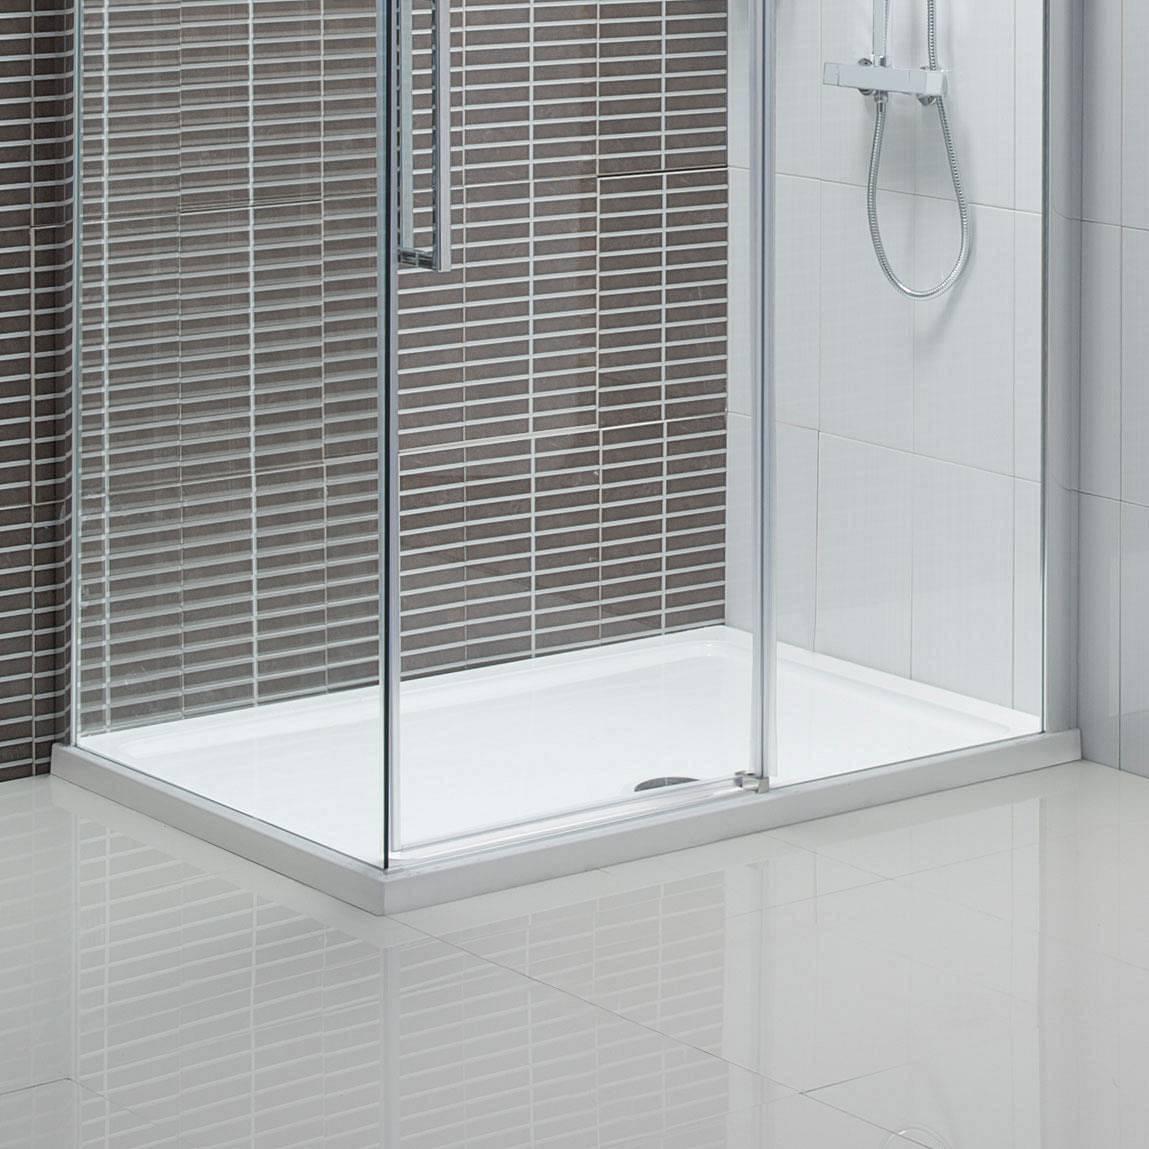 Shower Tray 700 x 1200 Shower Tray 1200 x 700